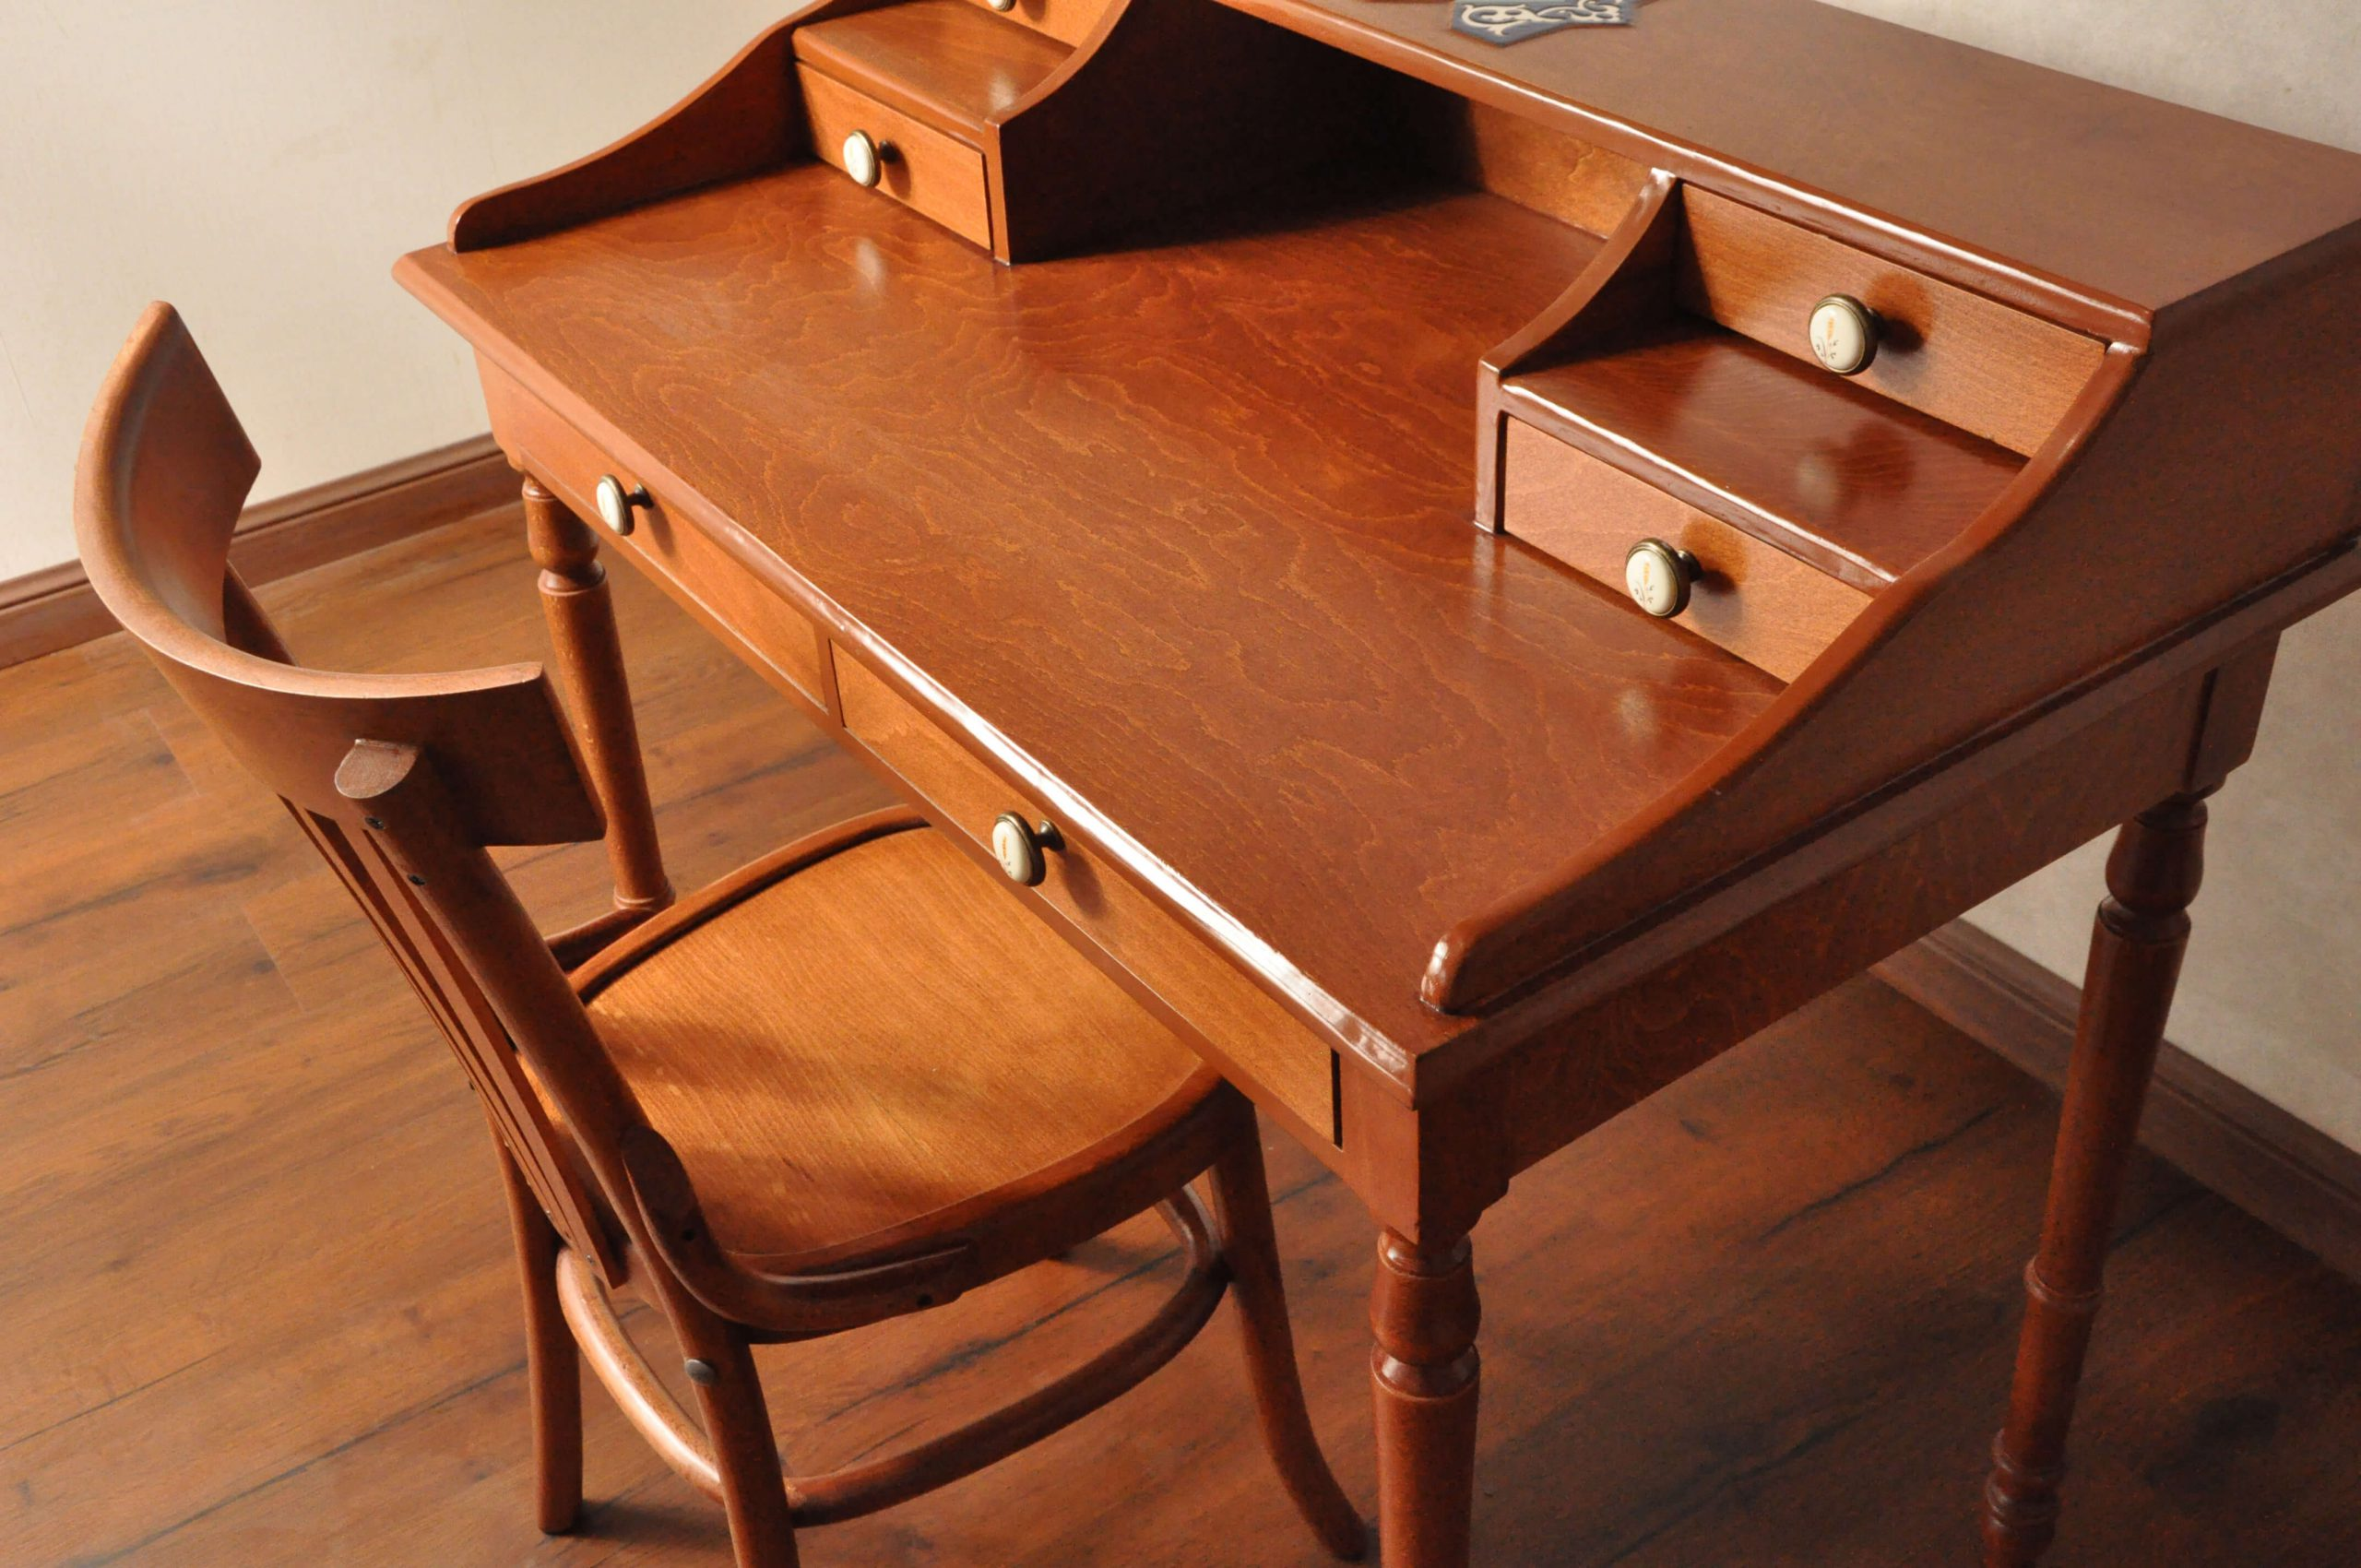 000 scaled - میز تحریر و صندلی طرح لهستانی -  - writing-desks